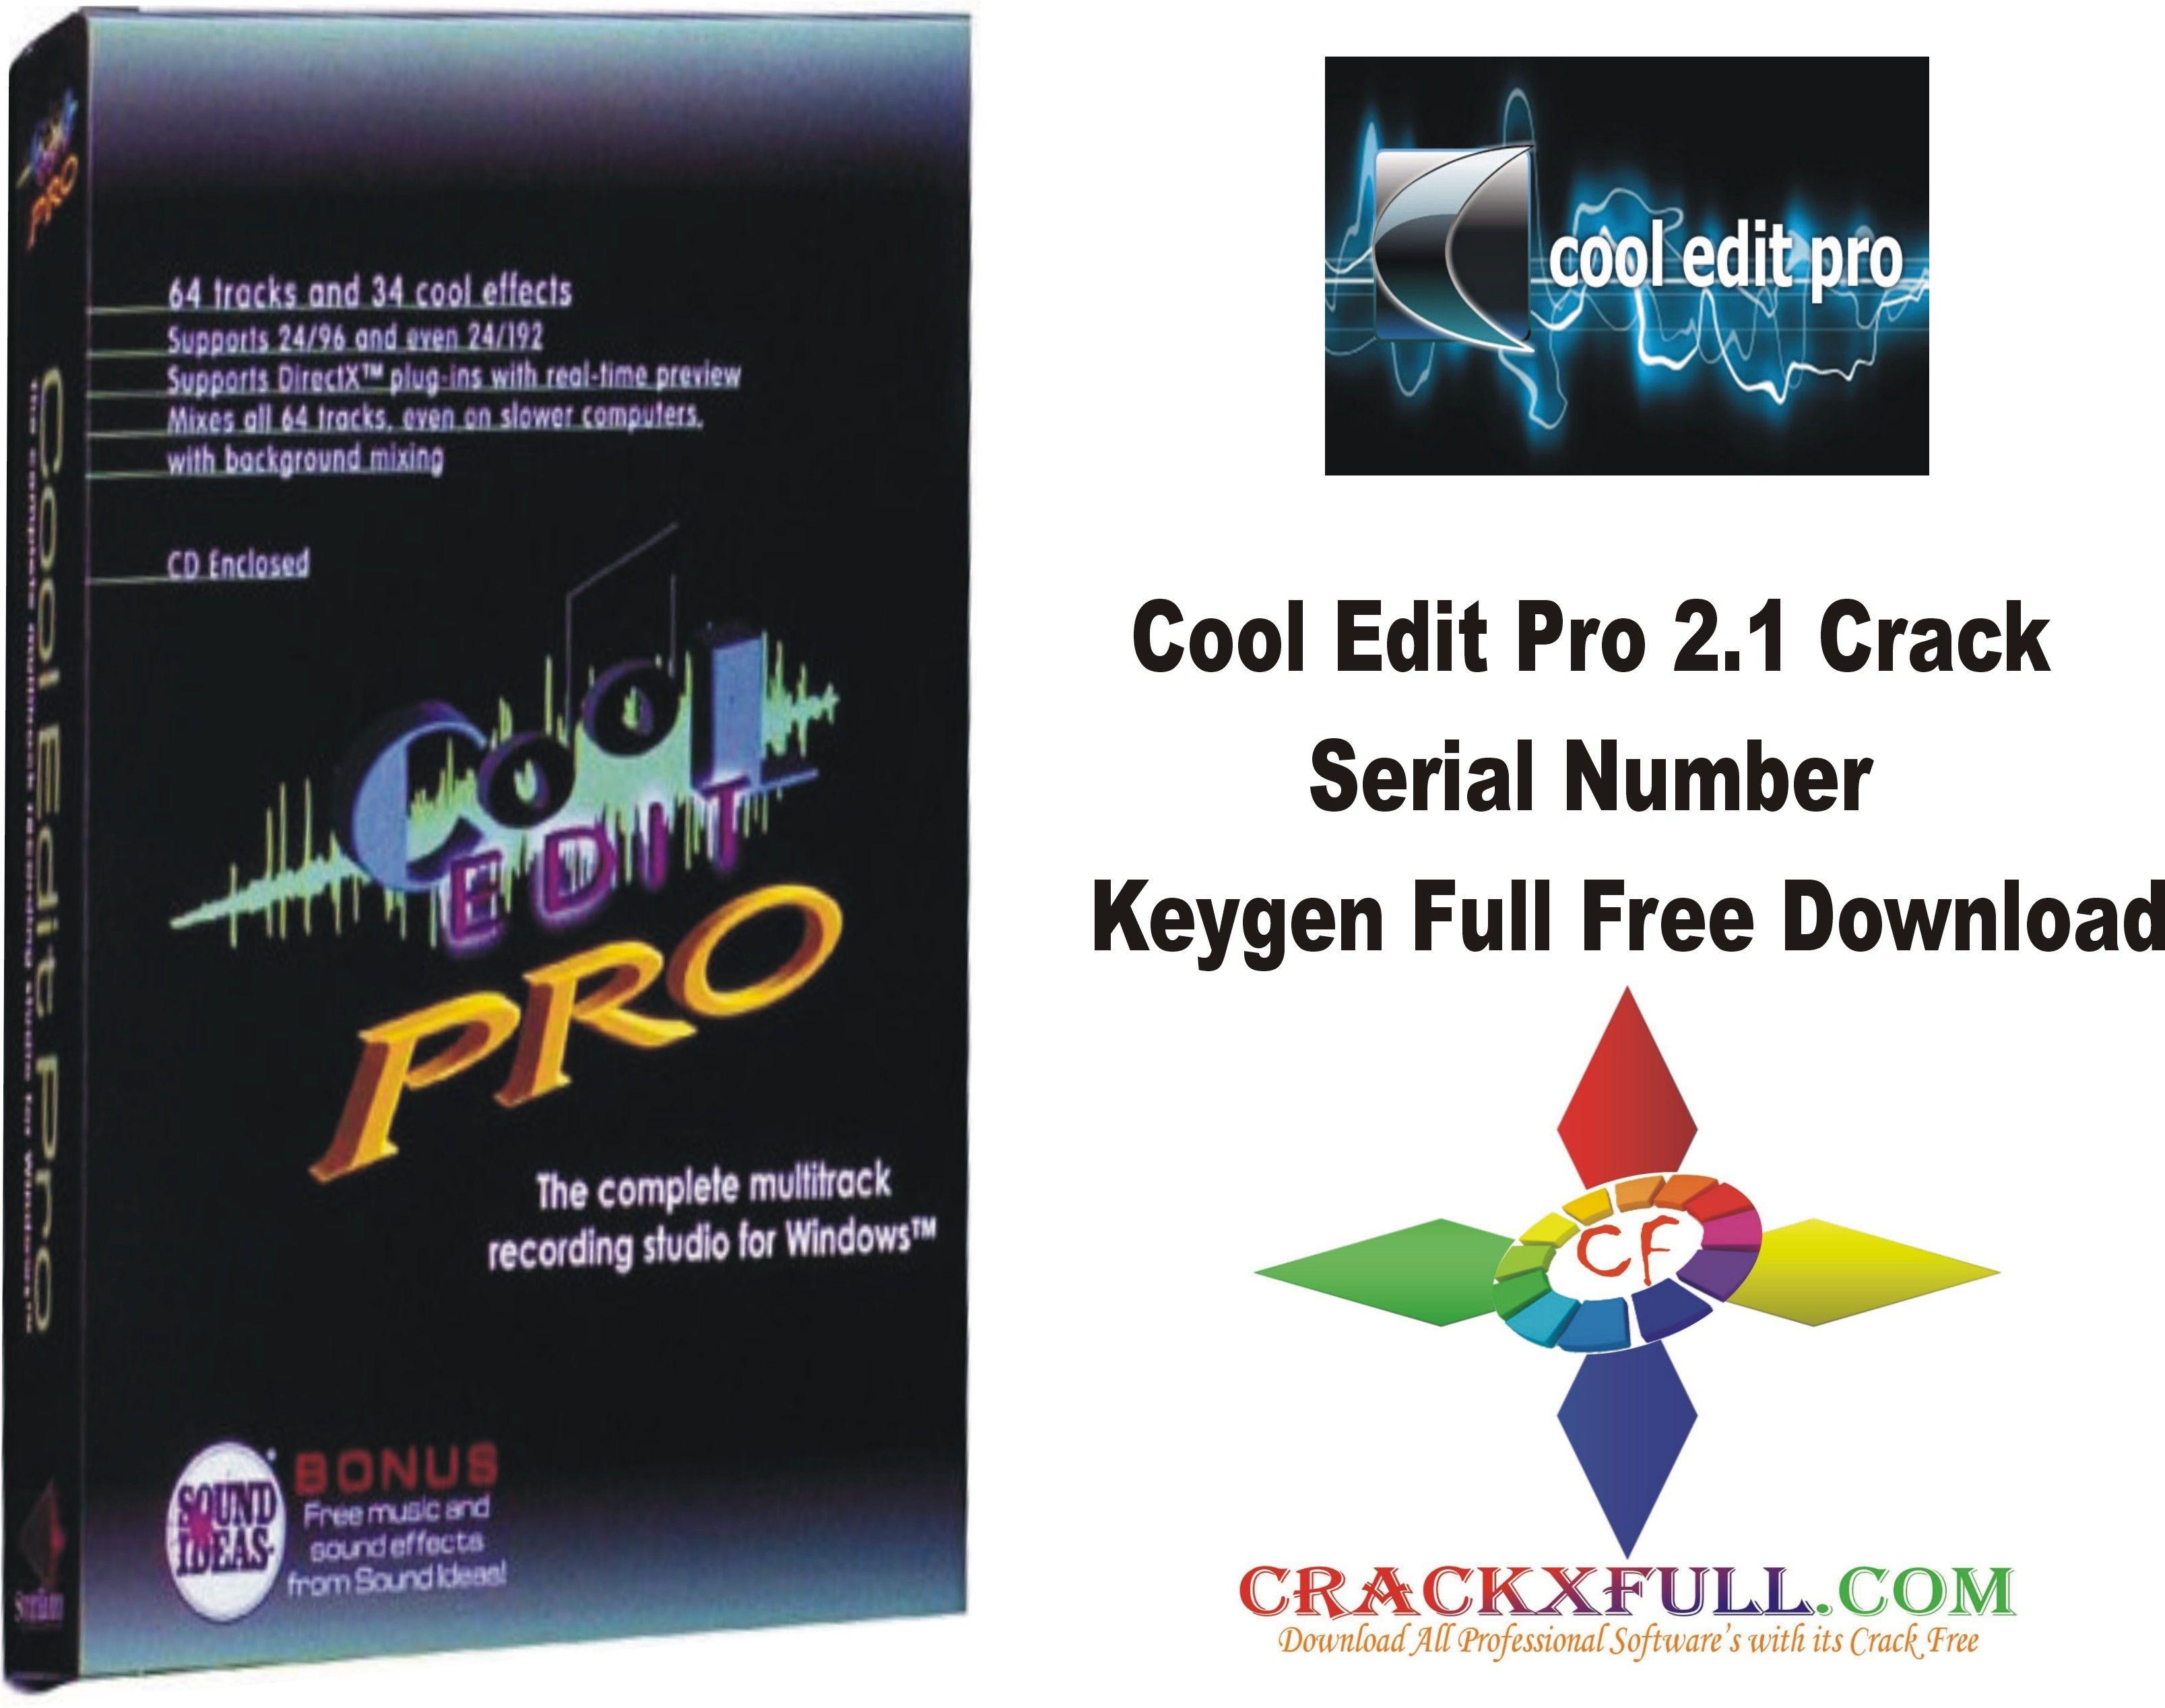 cool edit pro 2.1 free download full version